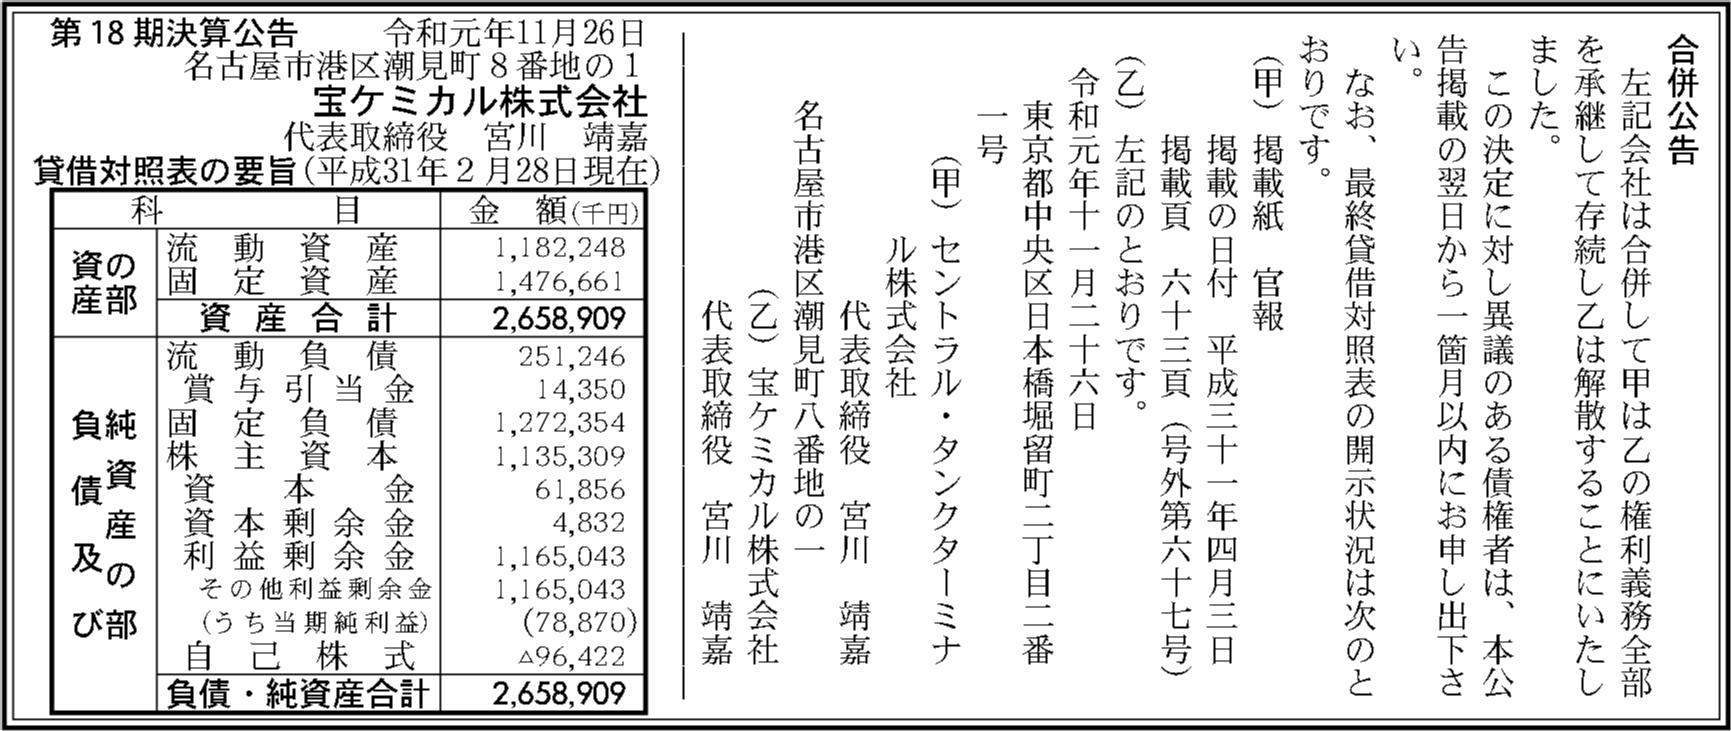 0089 e9ef4c9171126e2b5a79c8fcb1abbf25cb884921c9e7d753d56004bf07687b0f49db154810292cd7722b921d75f63a0f43feaf85c4e2bd6f8af45b5fd33ba72f 06